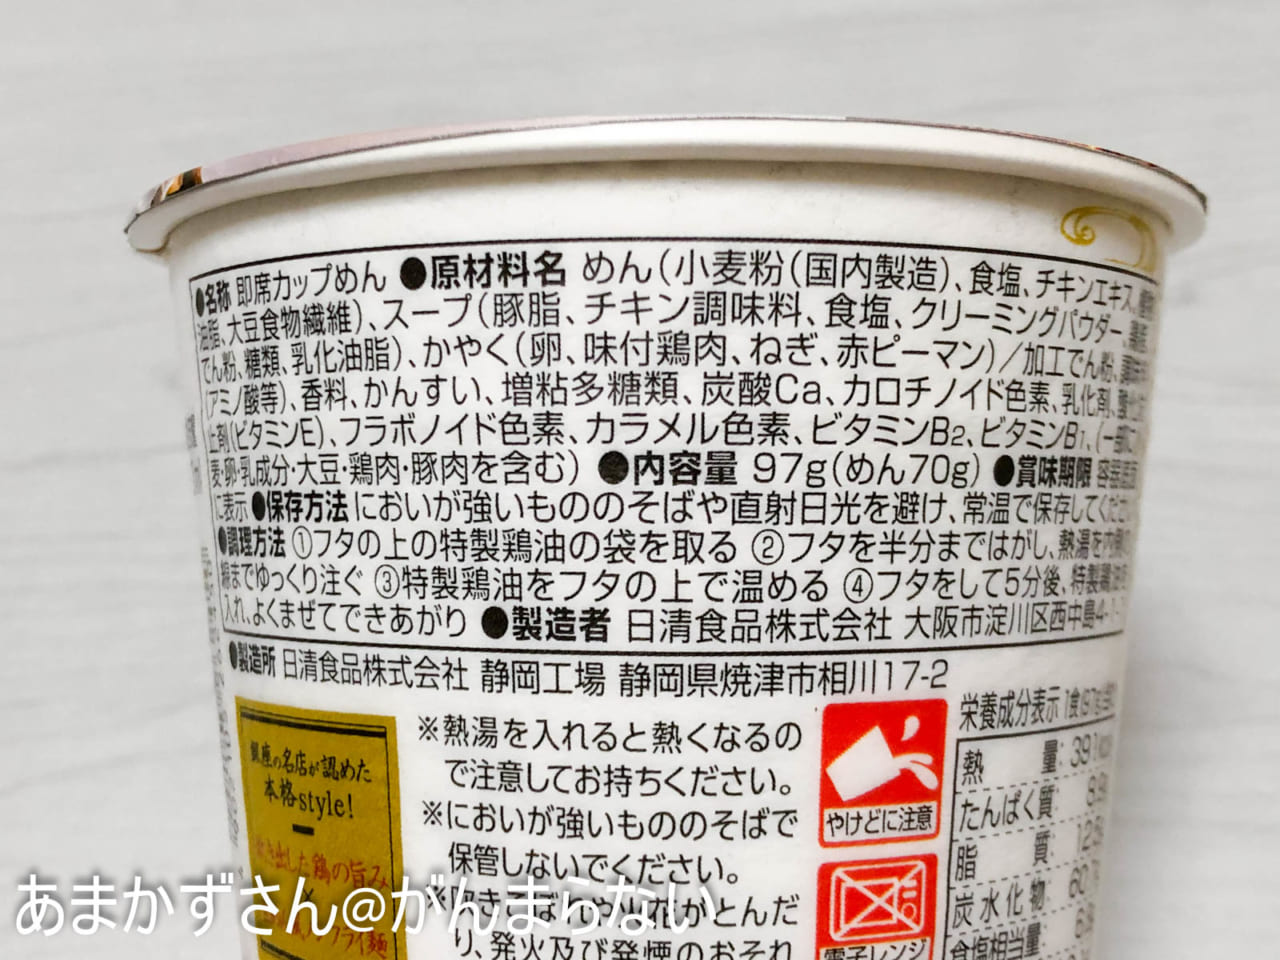 東京NOODLES 篝 鶏白湯Sobaの原材料表